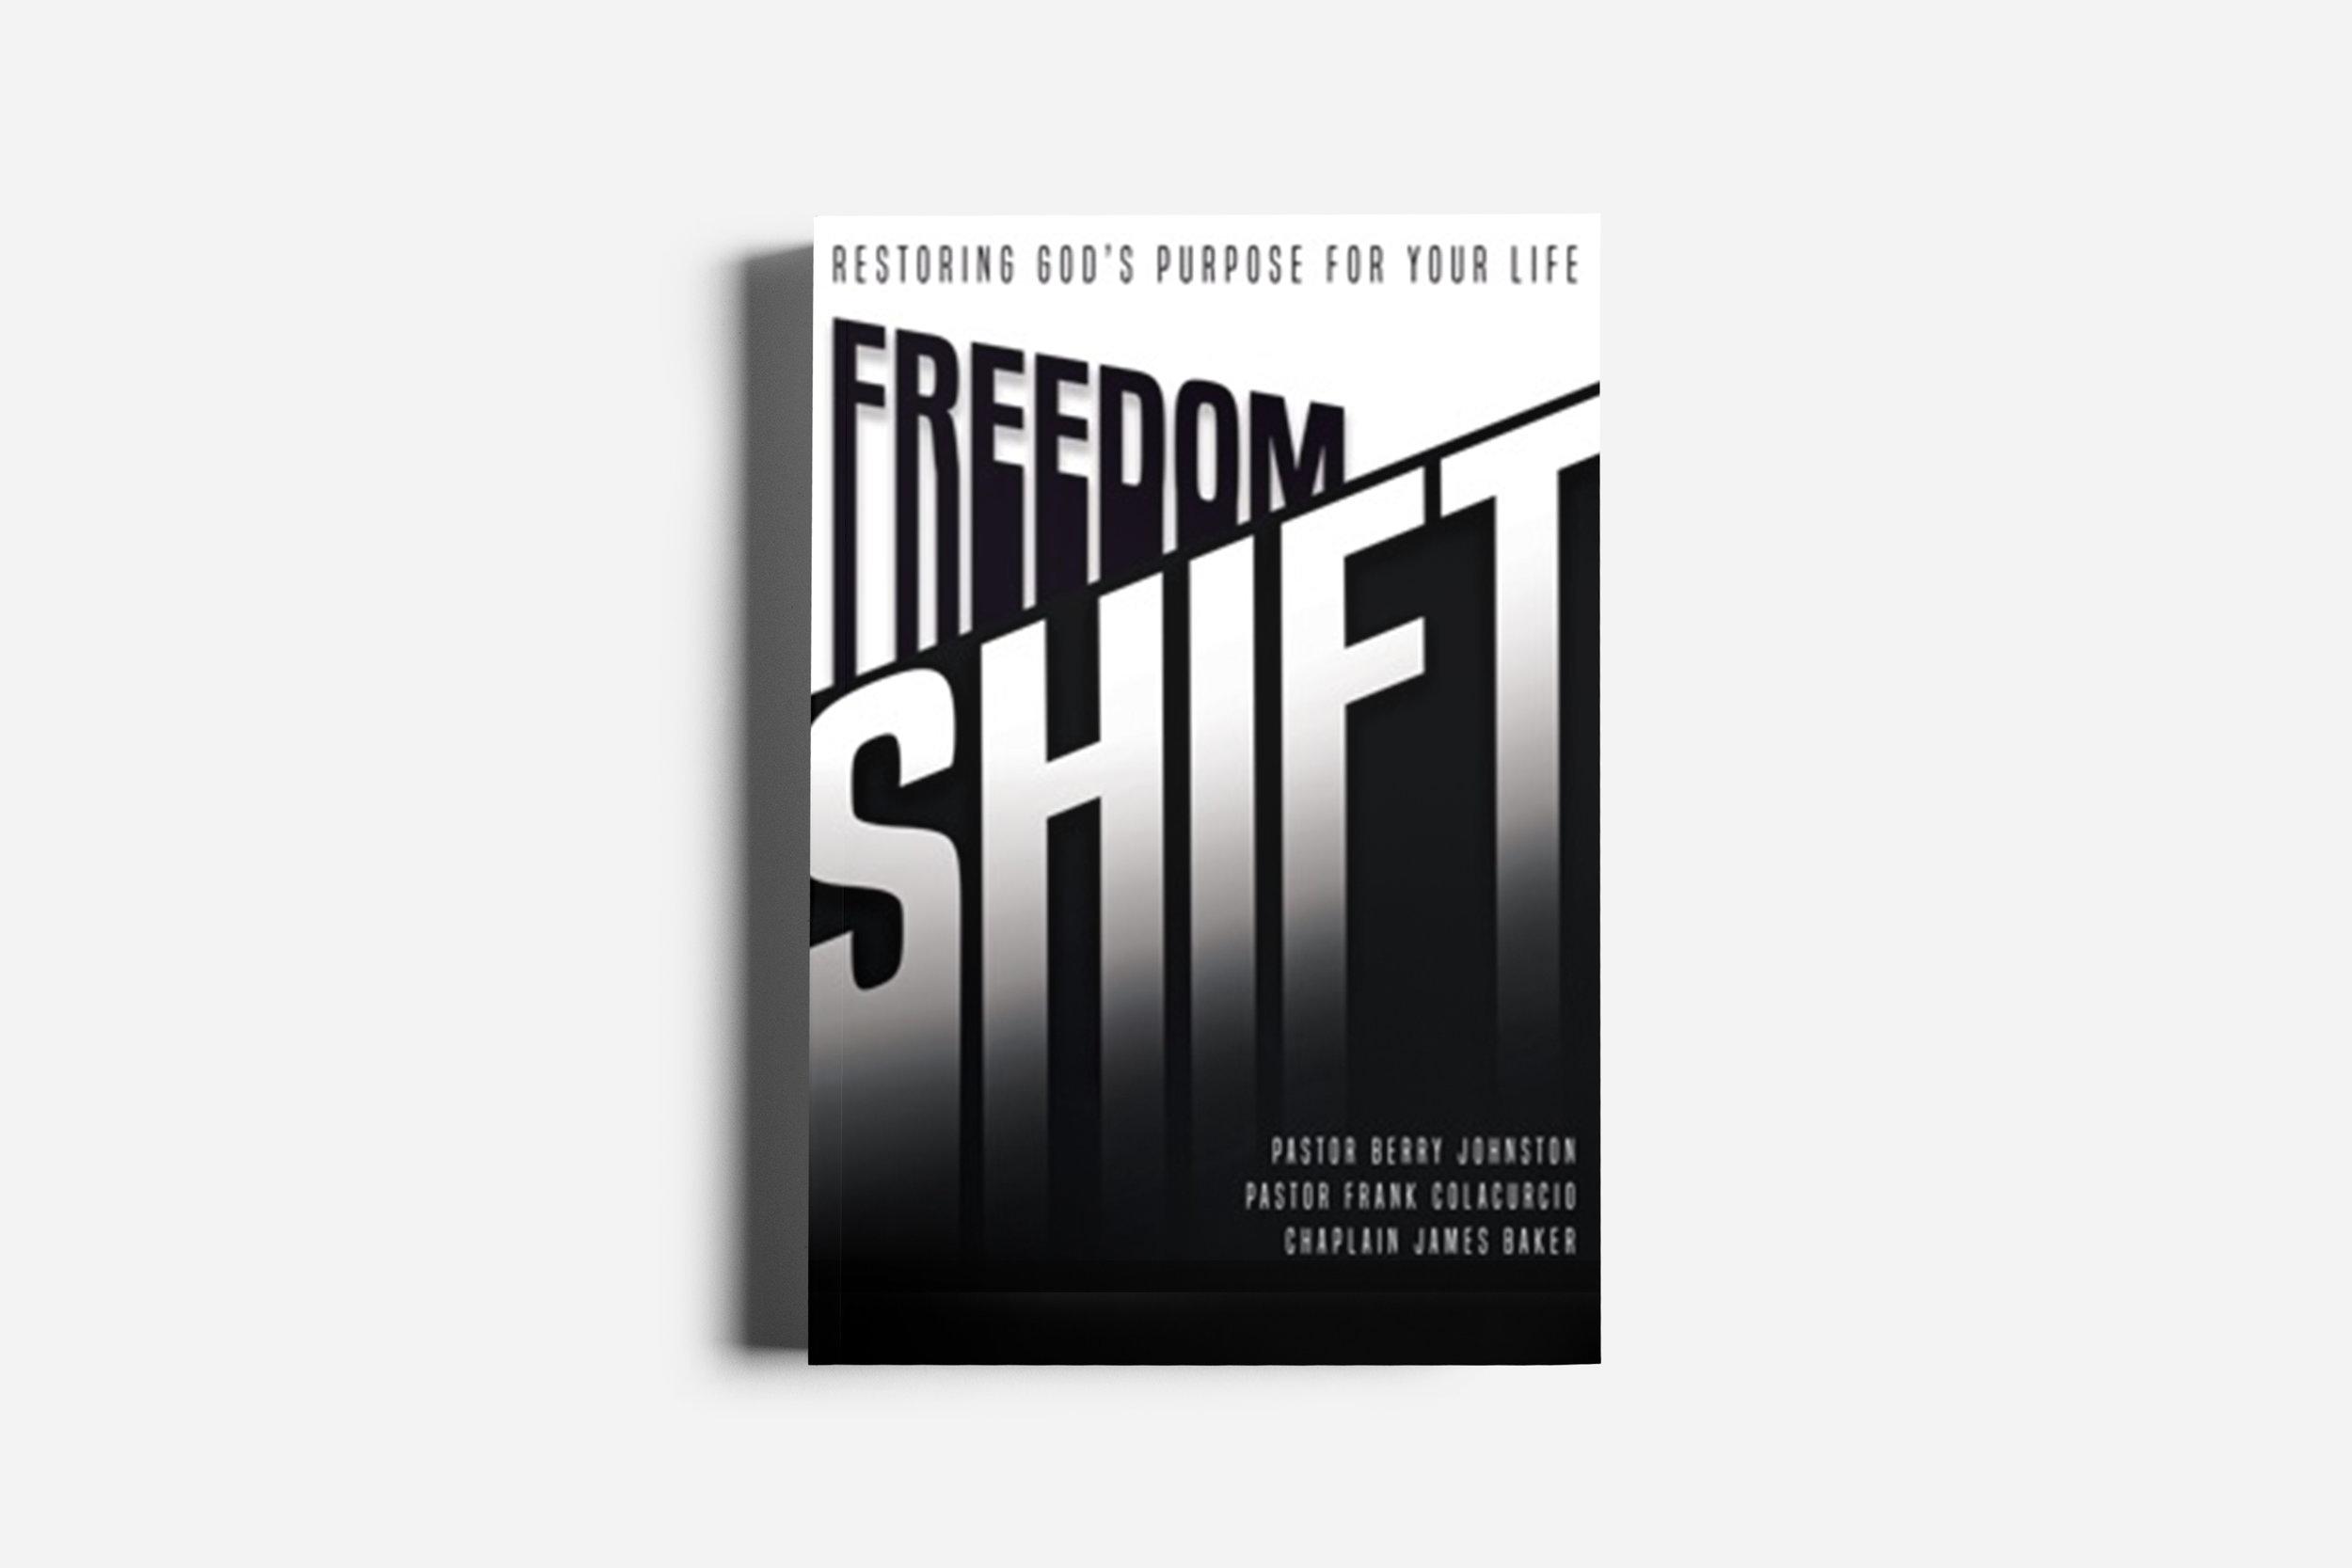 Freedomshift.jpg